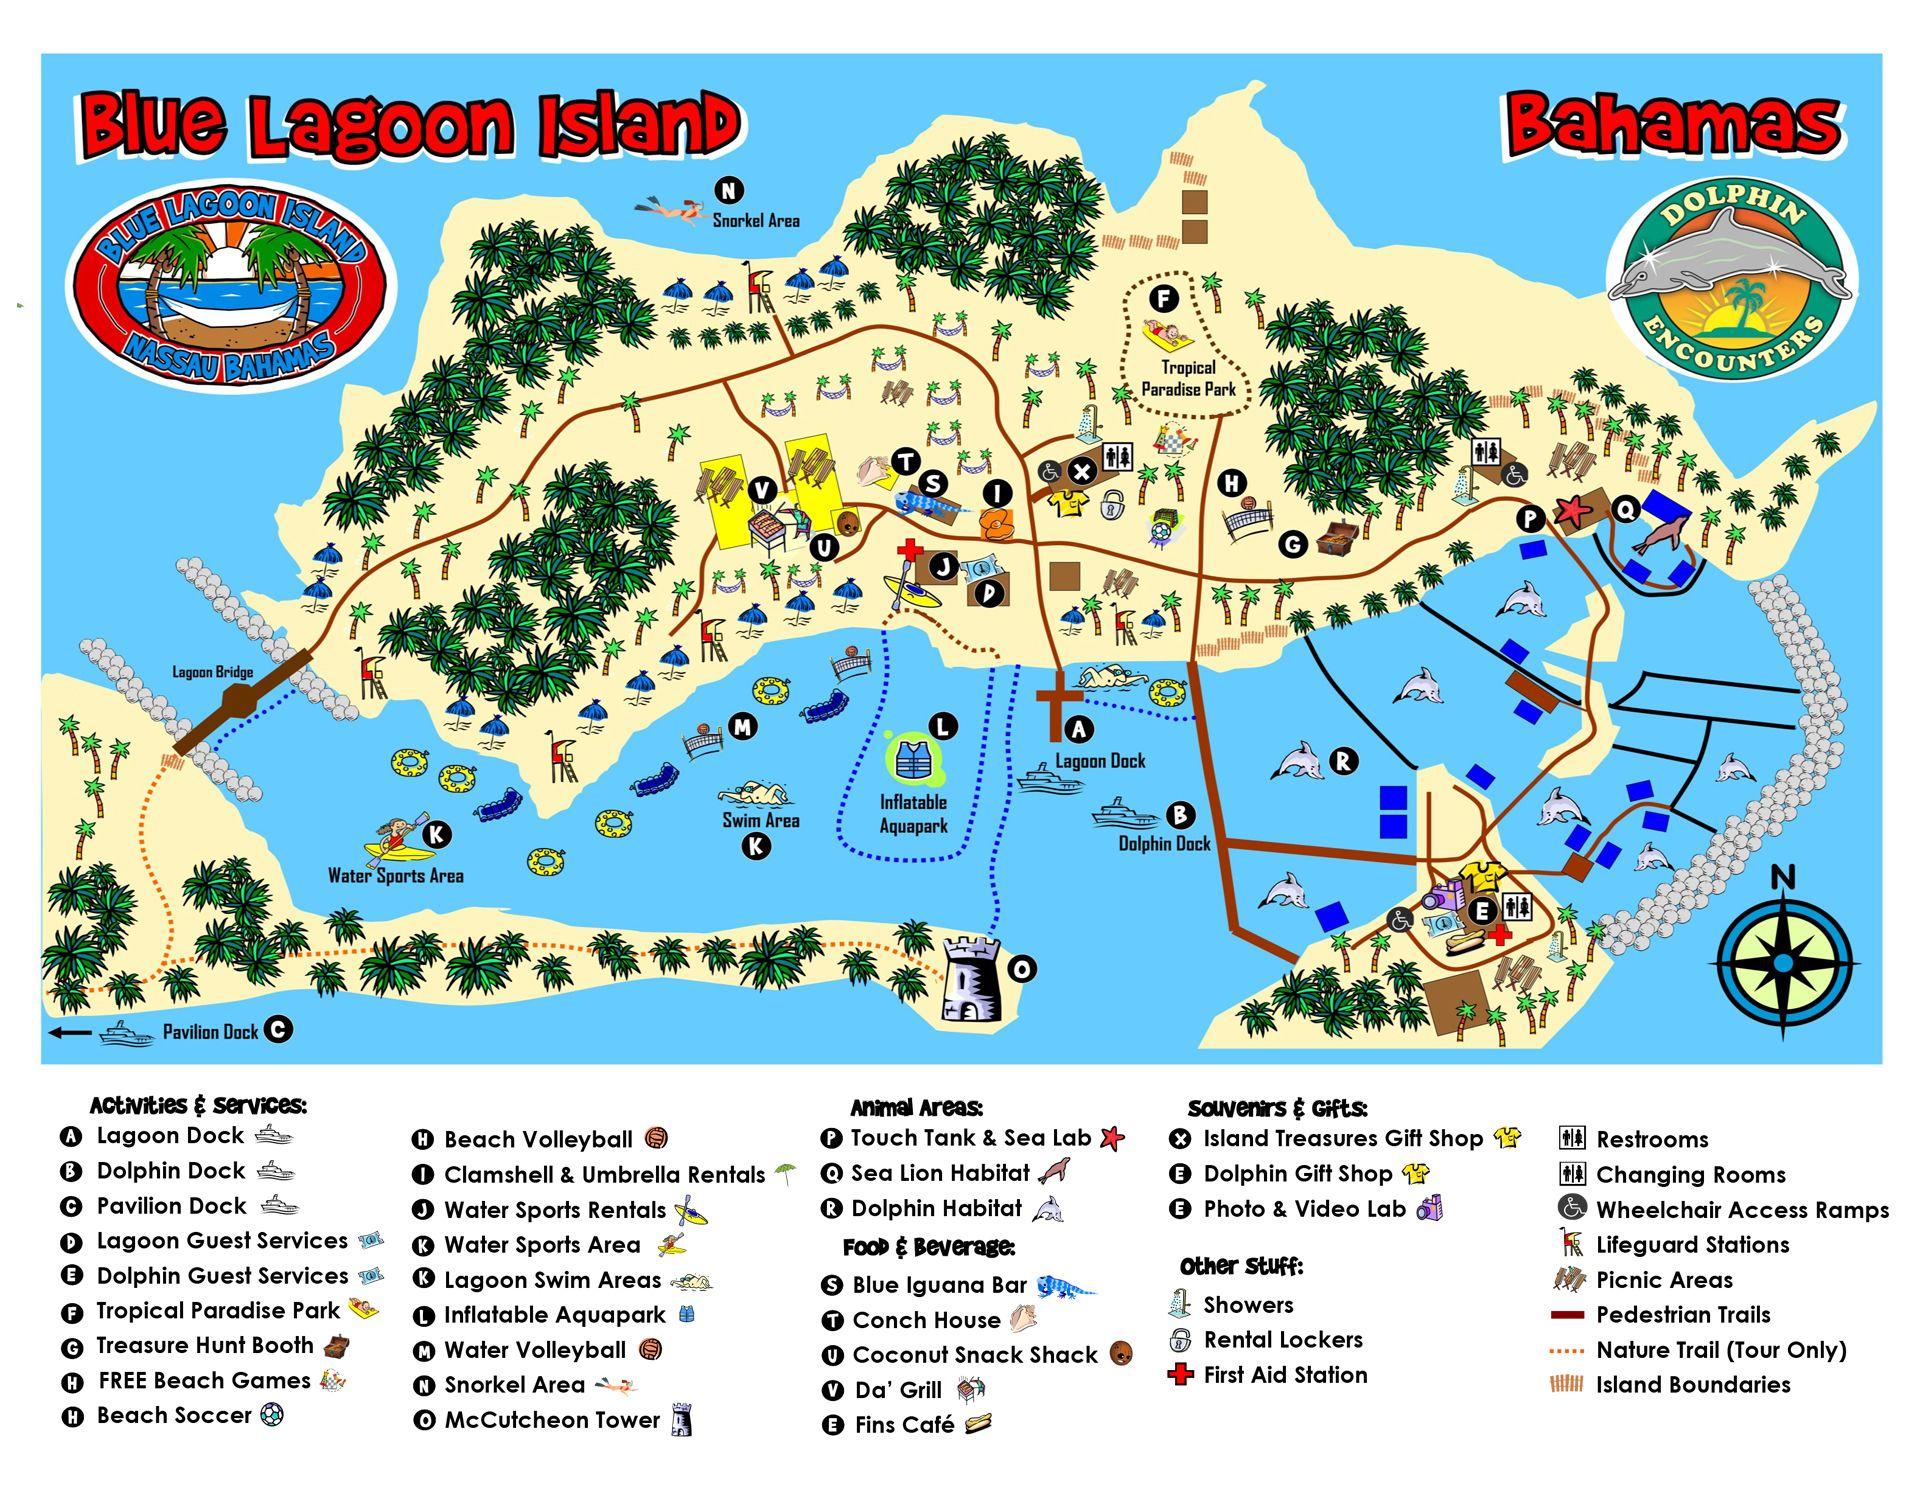 Parkmap Dolphin Encounters Blue Lagoon Island Bahamas